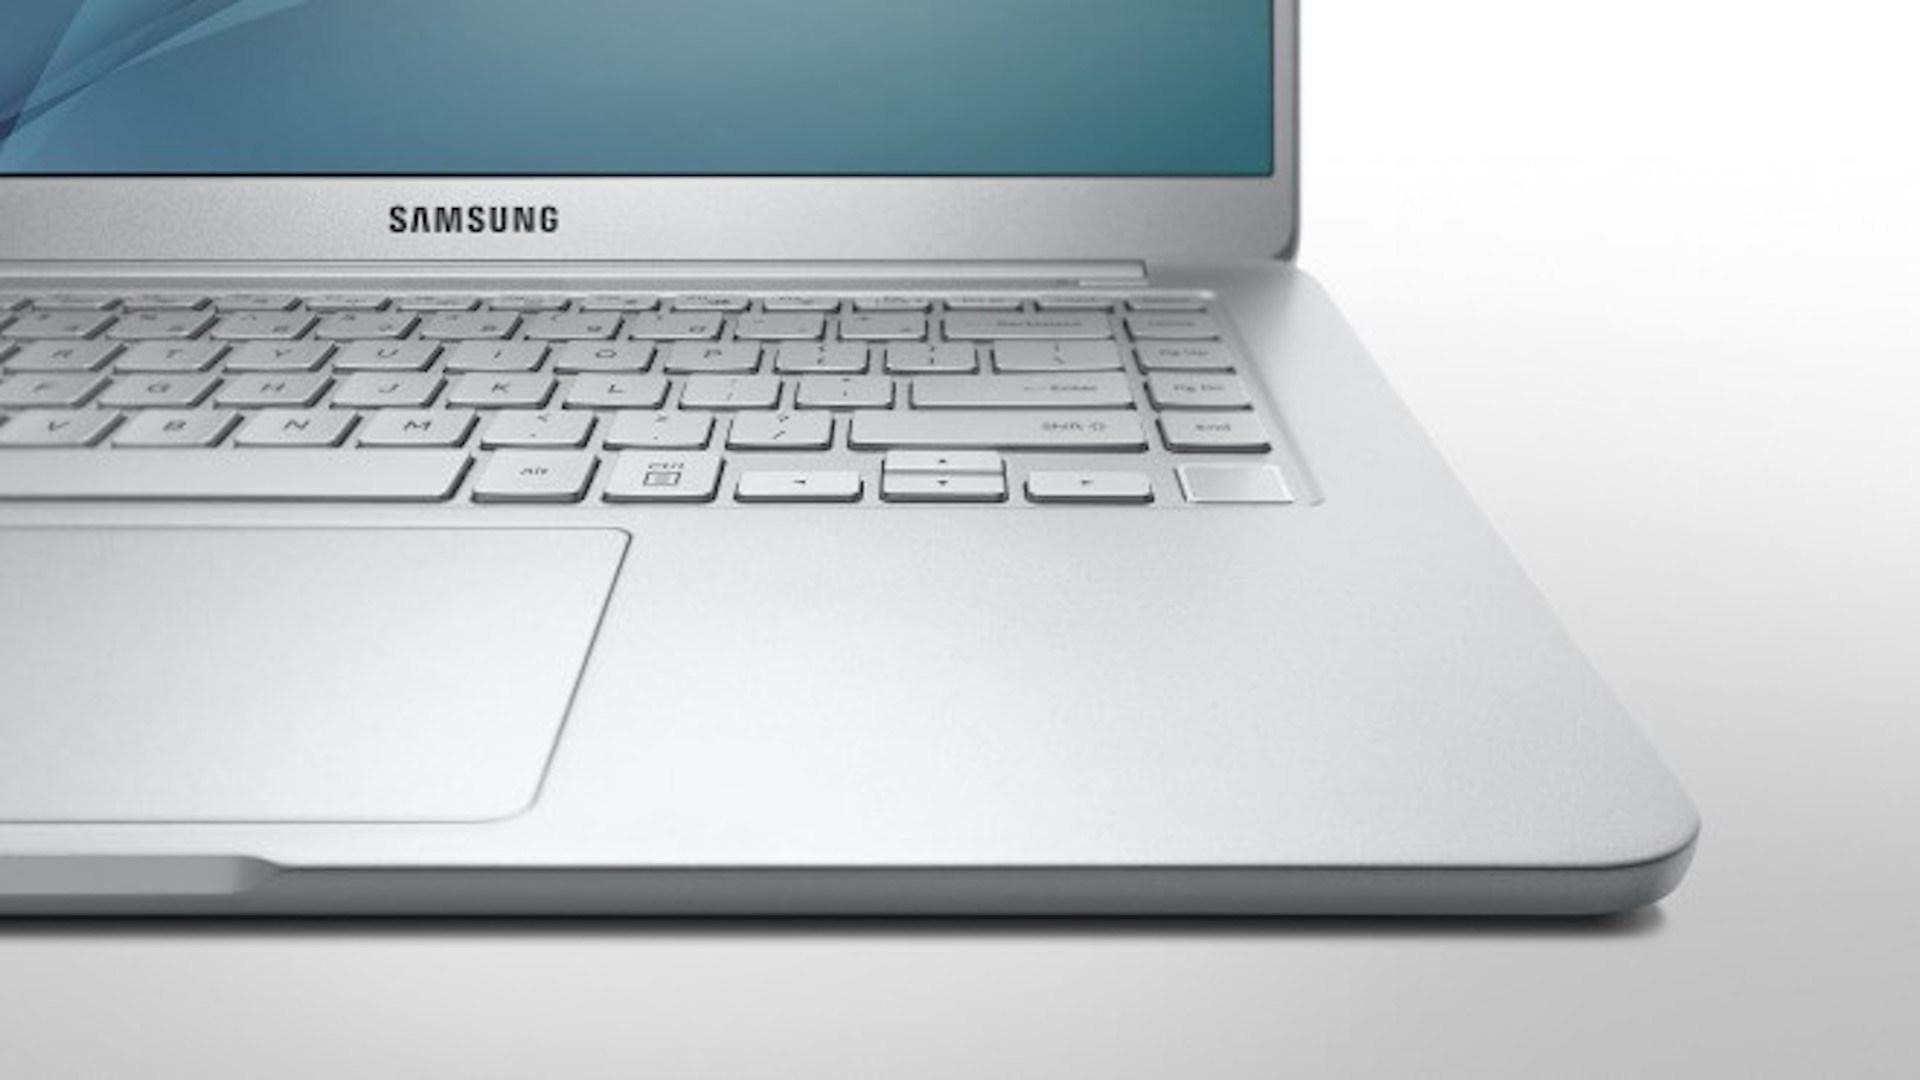 Samsung, Notebook, Chromebook, Samsung Series 9, Samsung Notebook 9